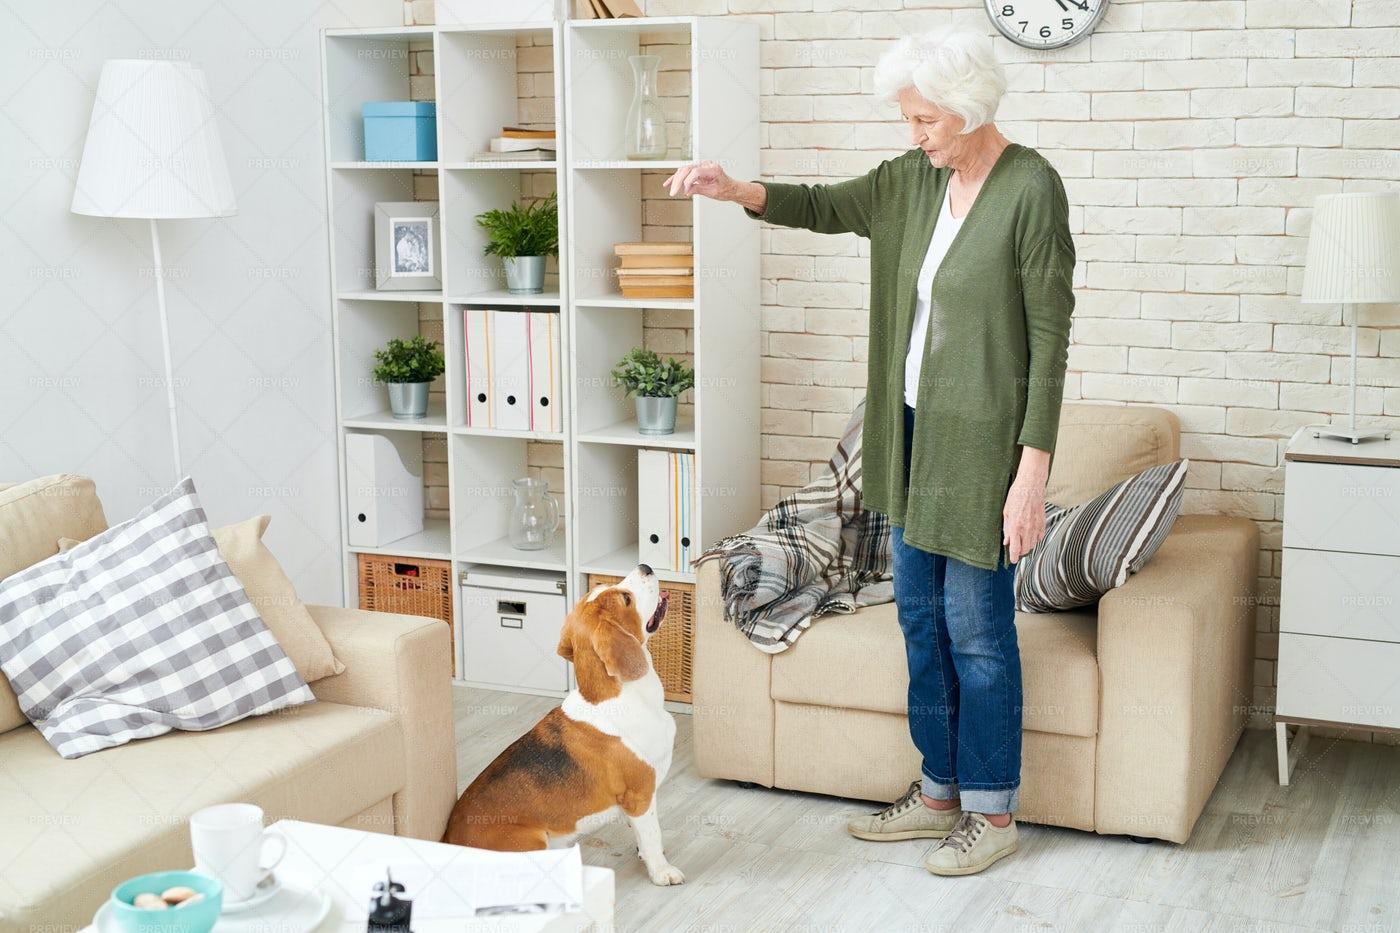 Senior Woman Playing With Dog: Stock Photos